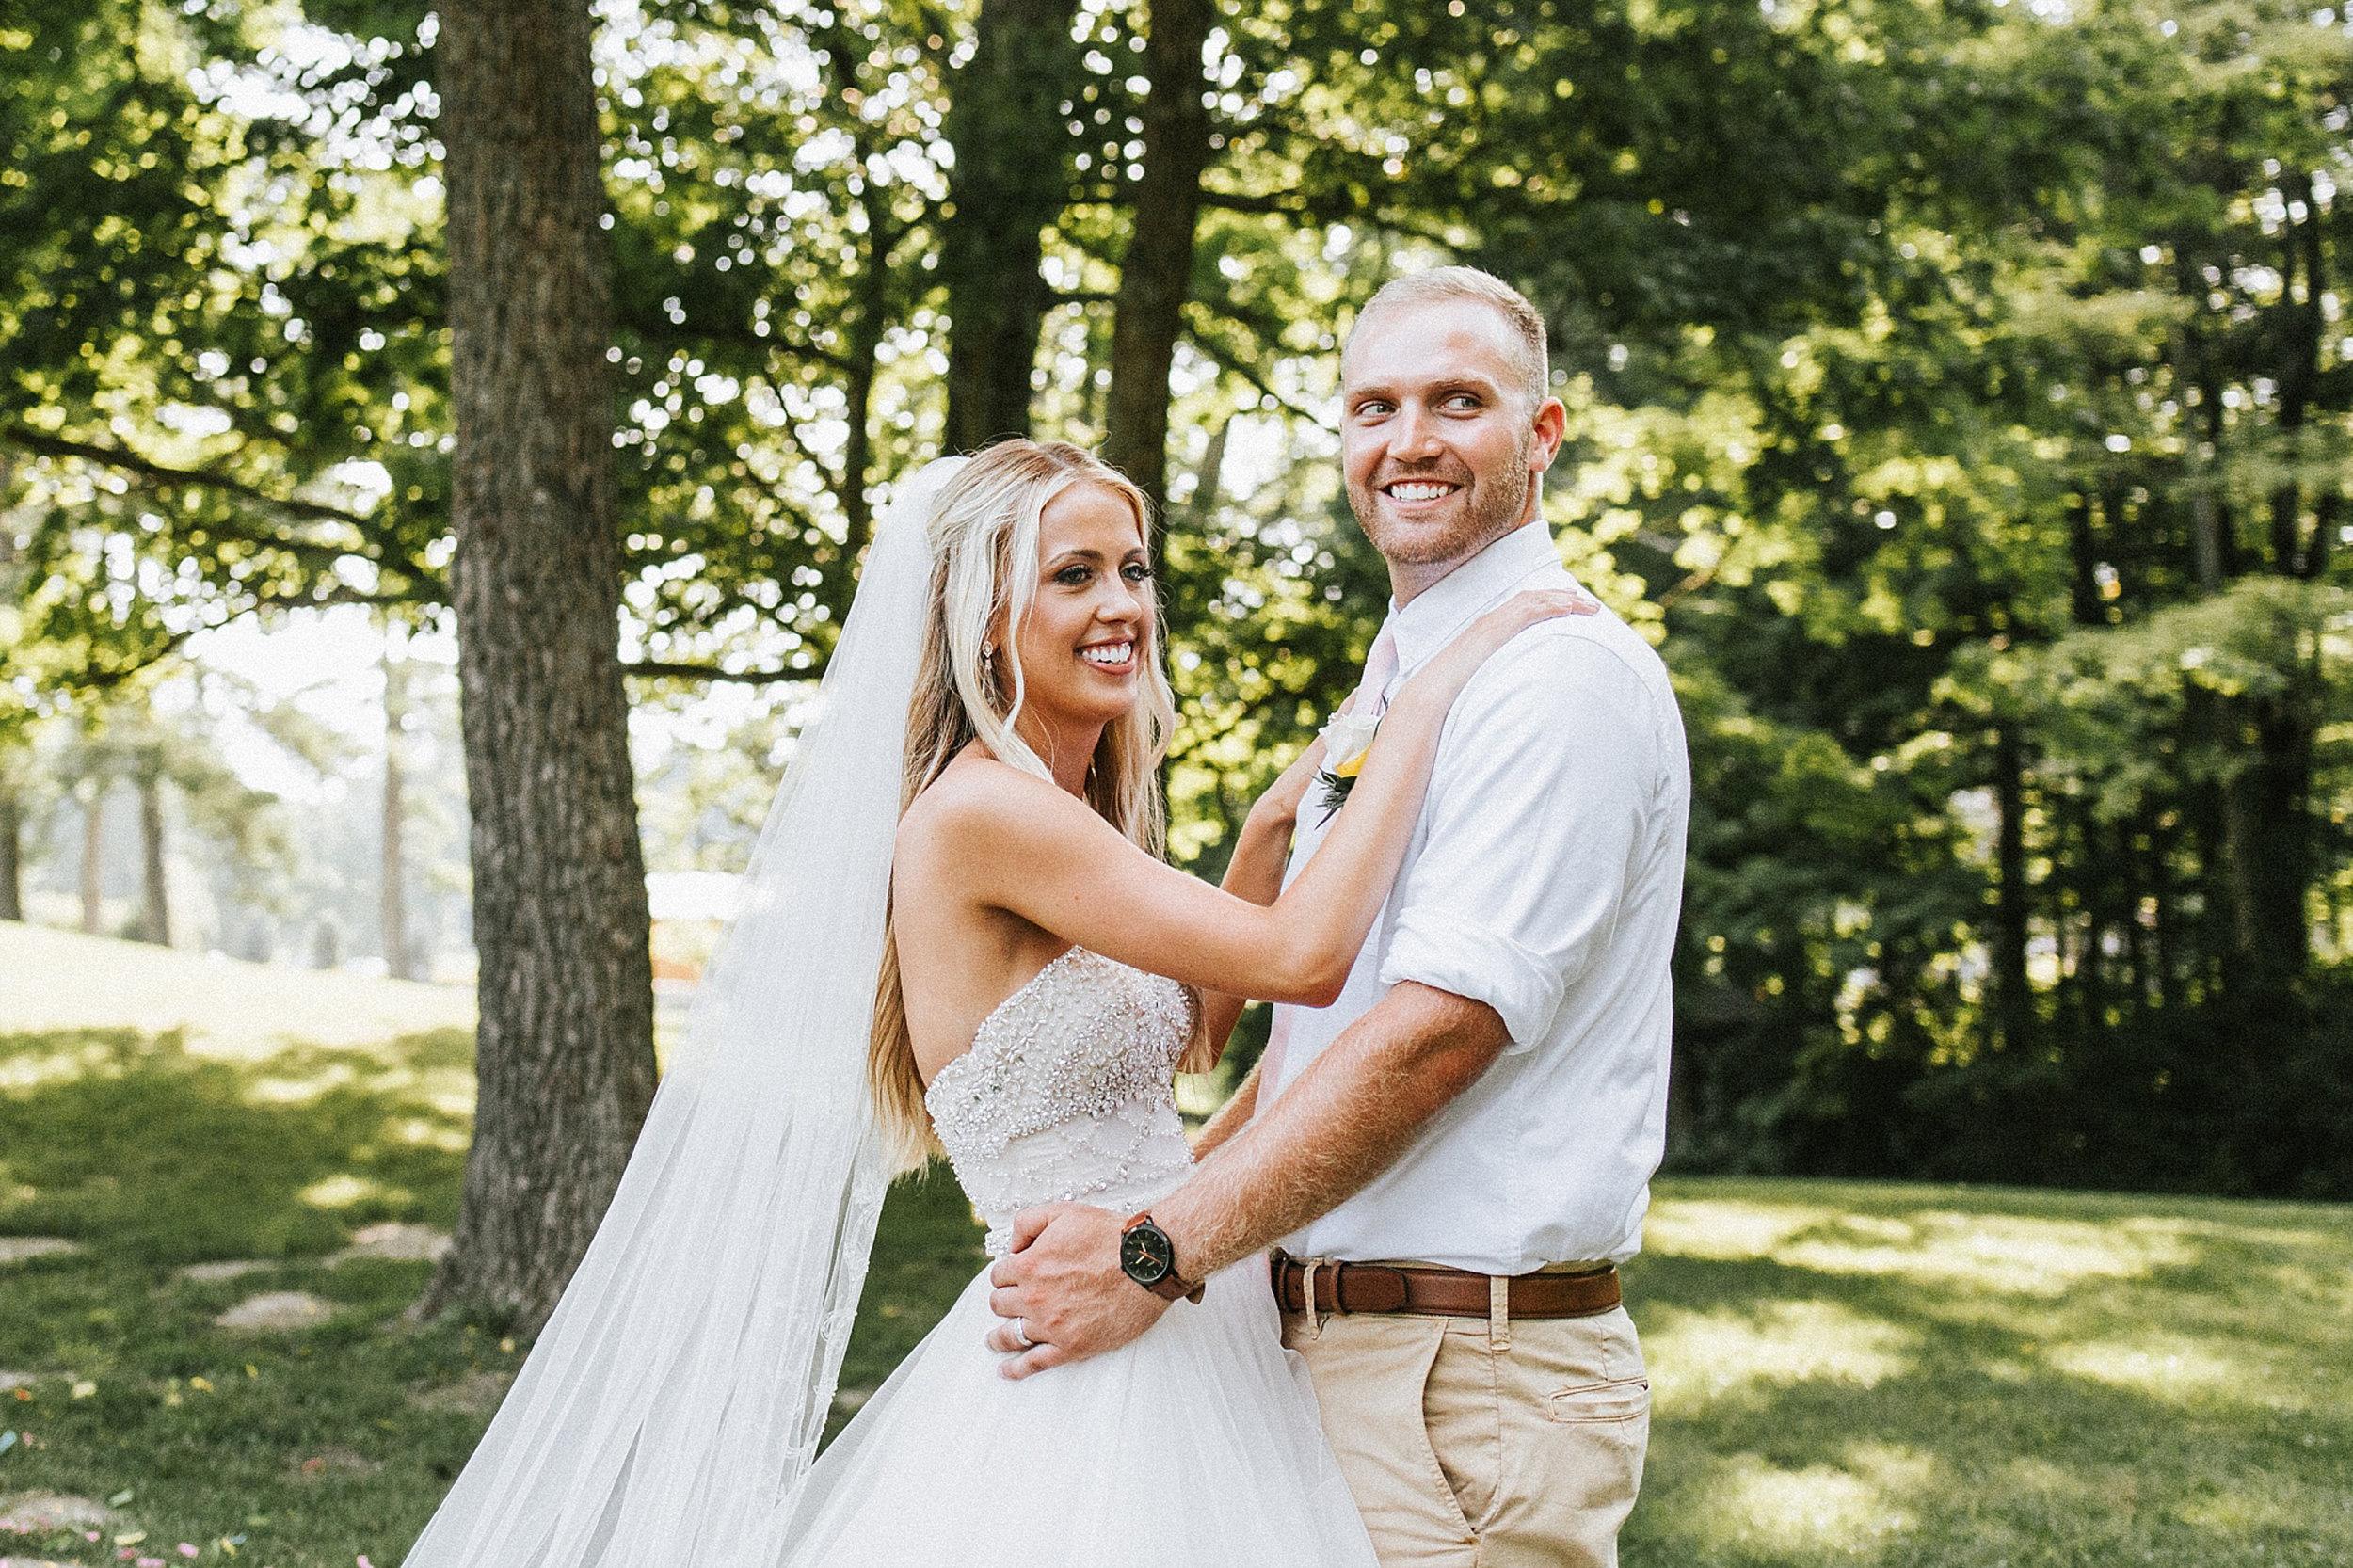 Brooke Townsend Photography - Cincinnati Wedding Photographer (94 of 153).jpg